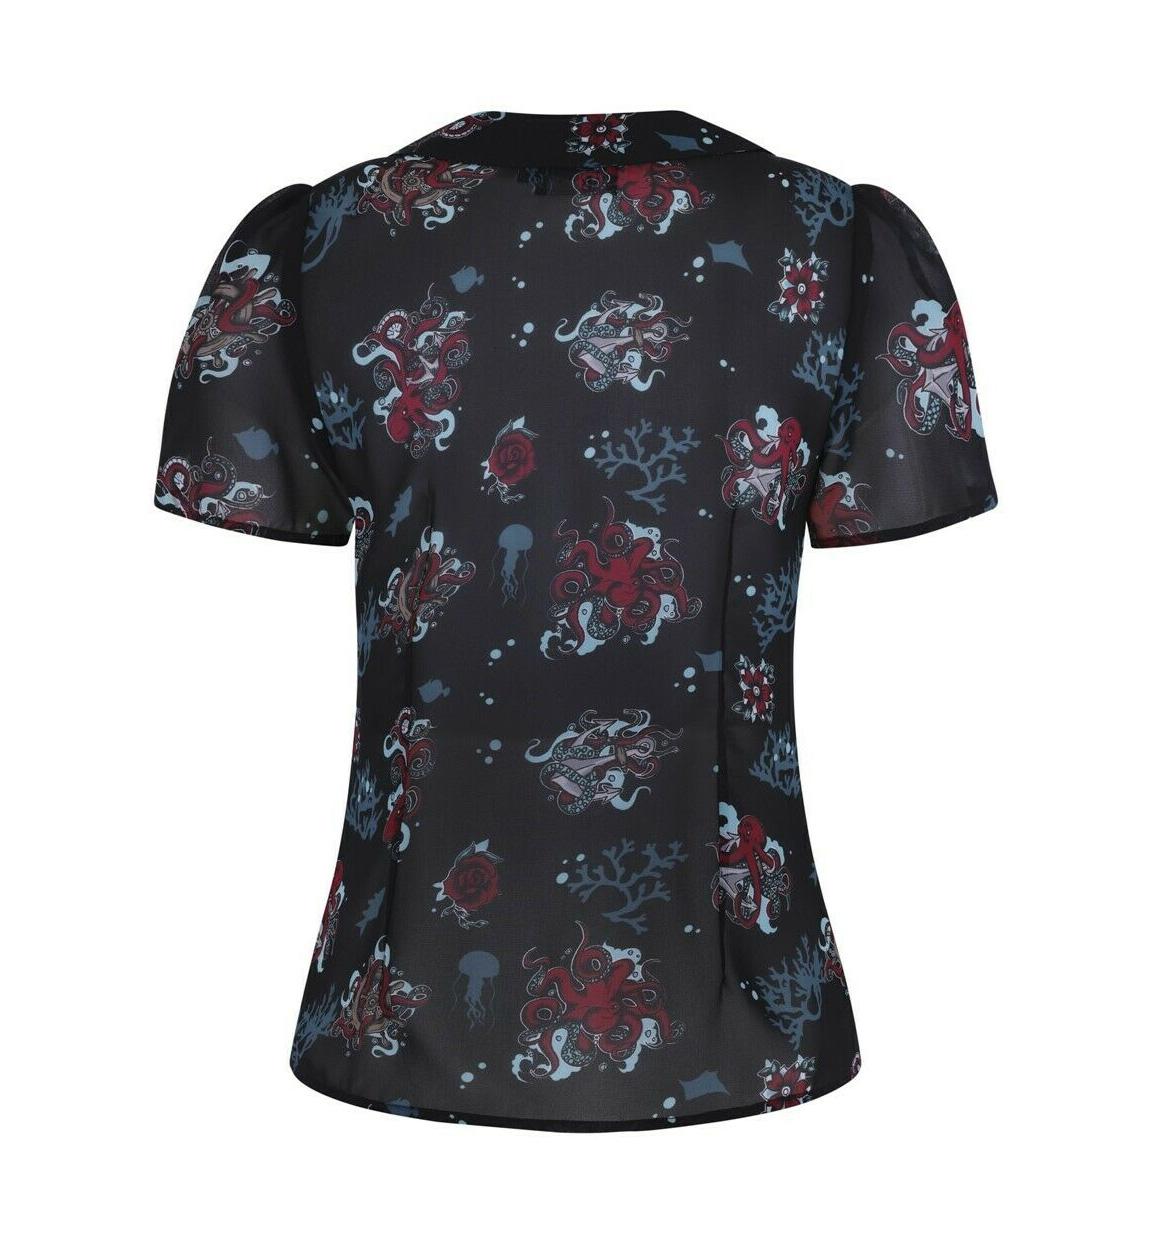 Hell-Bunny-50s-Shirt-Top-Black-Ocean-Octopus-Roses-POSEIDON-Blouse-All-Sizes thumbnail 37